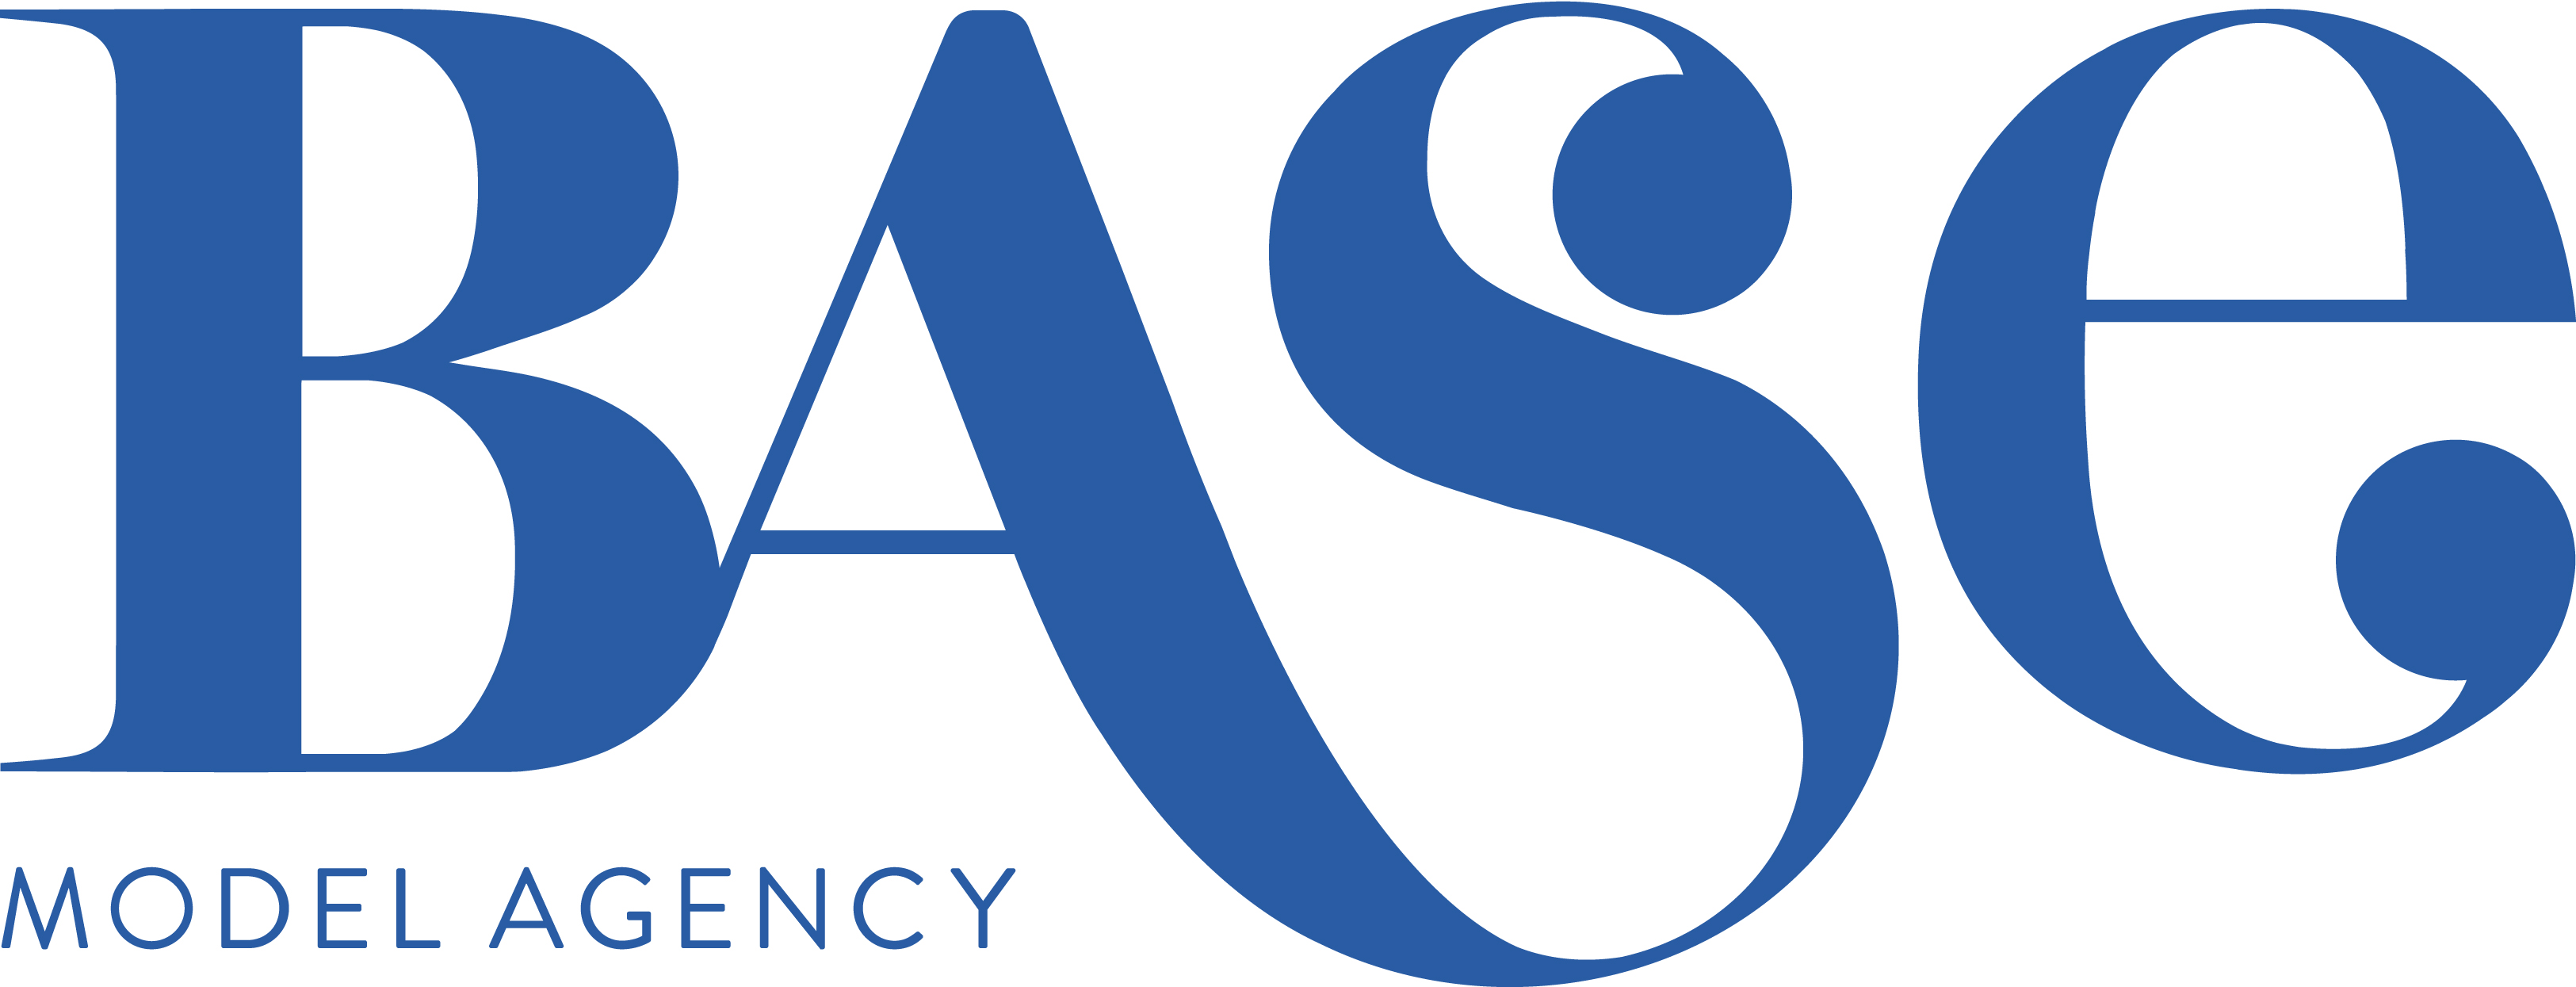 Base Model Agency